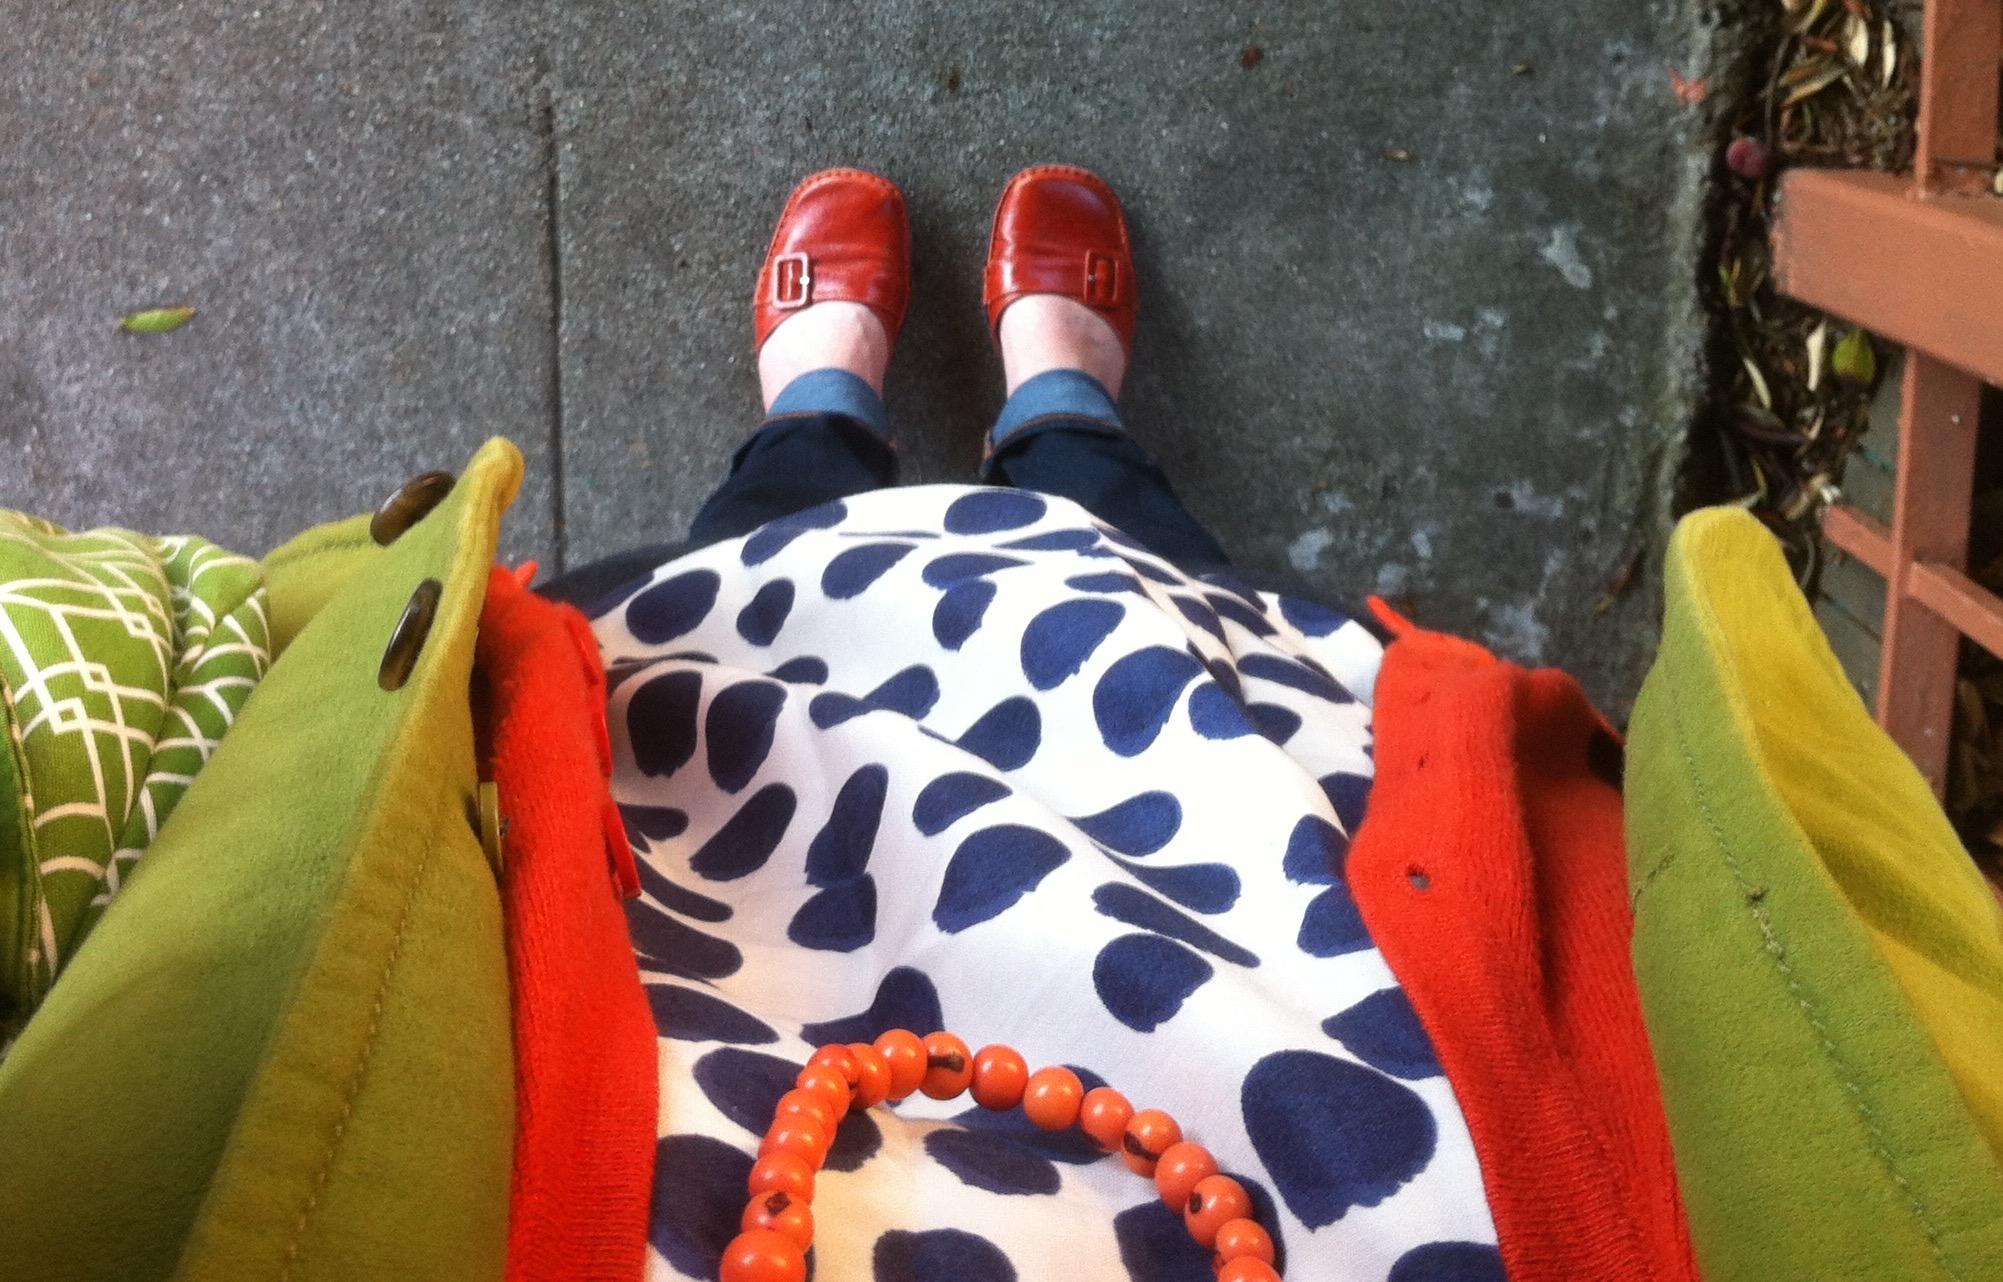 outfit feet orange green navy.jpg